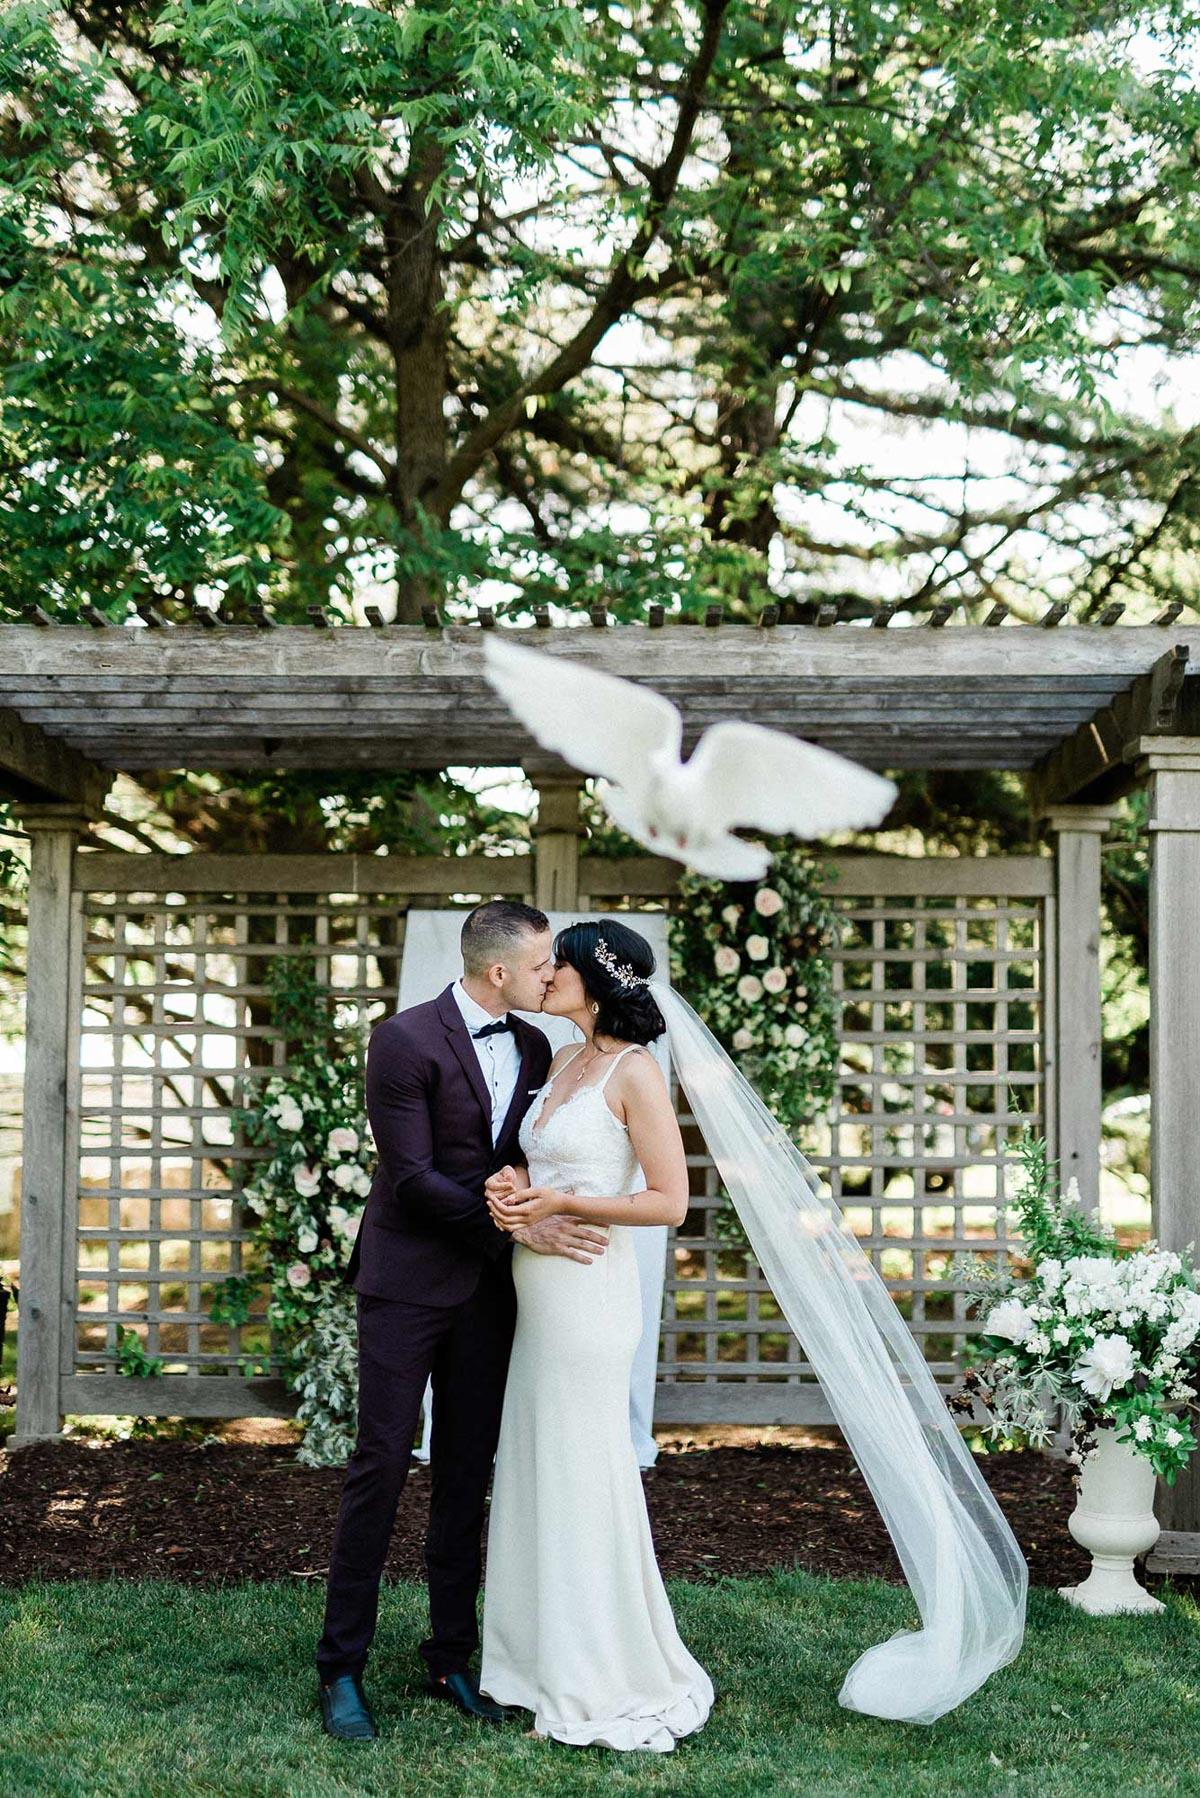 destiny-dawn-photography-vineyard-bride-swish-list-knollwood-golf-and-country-club-ancaster-wedding-editorial-7.jpg